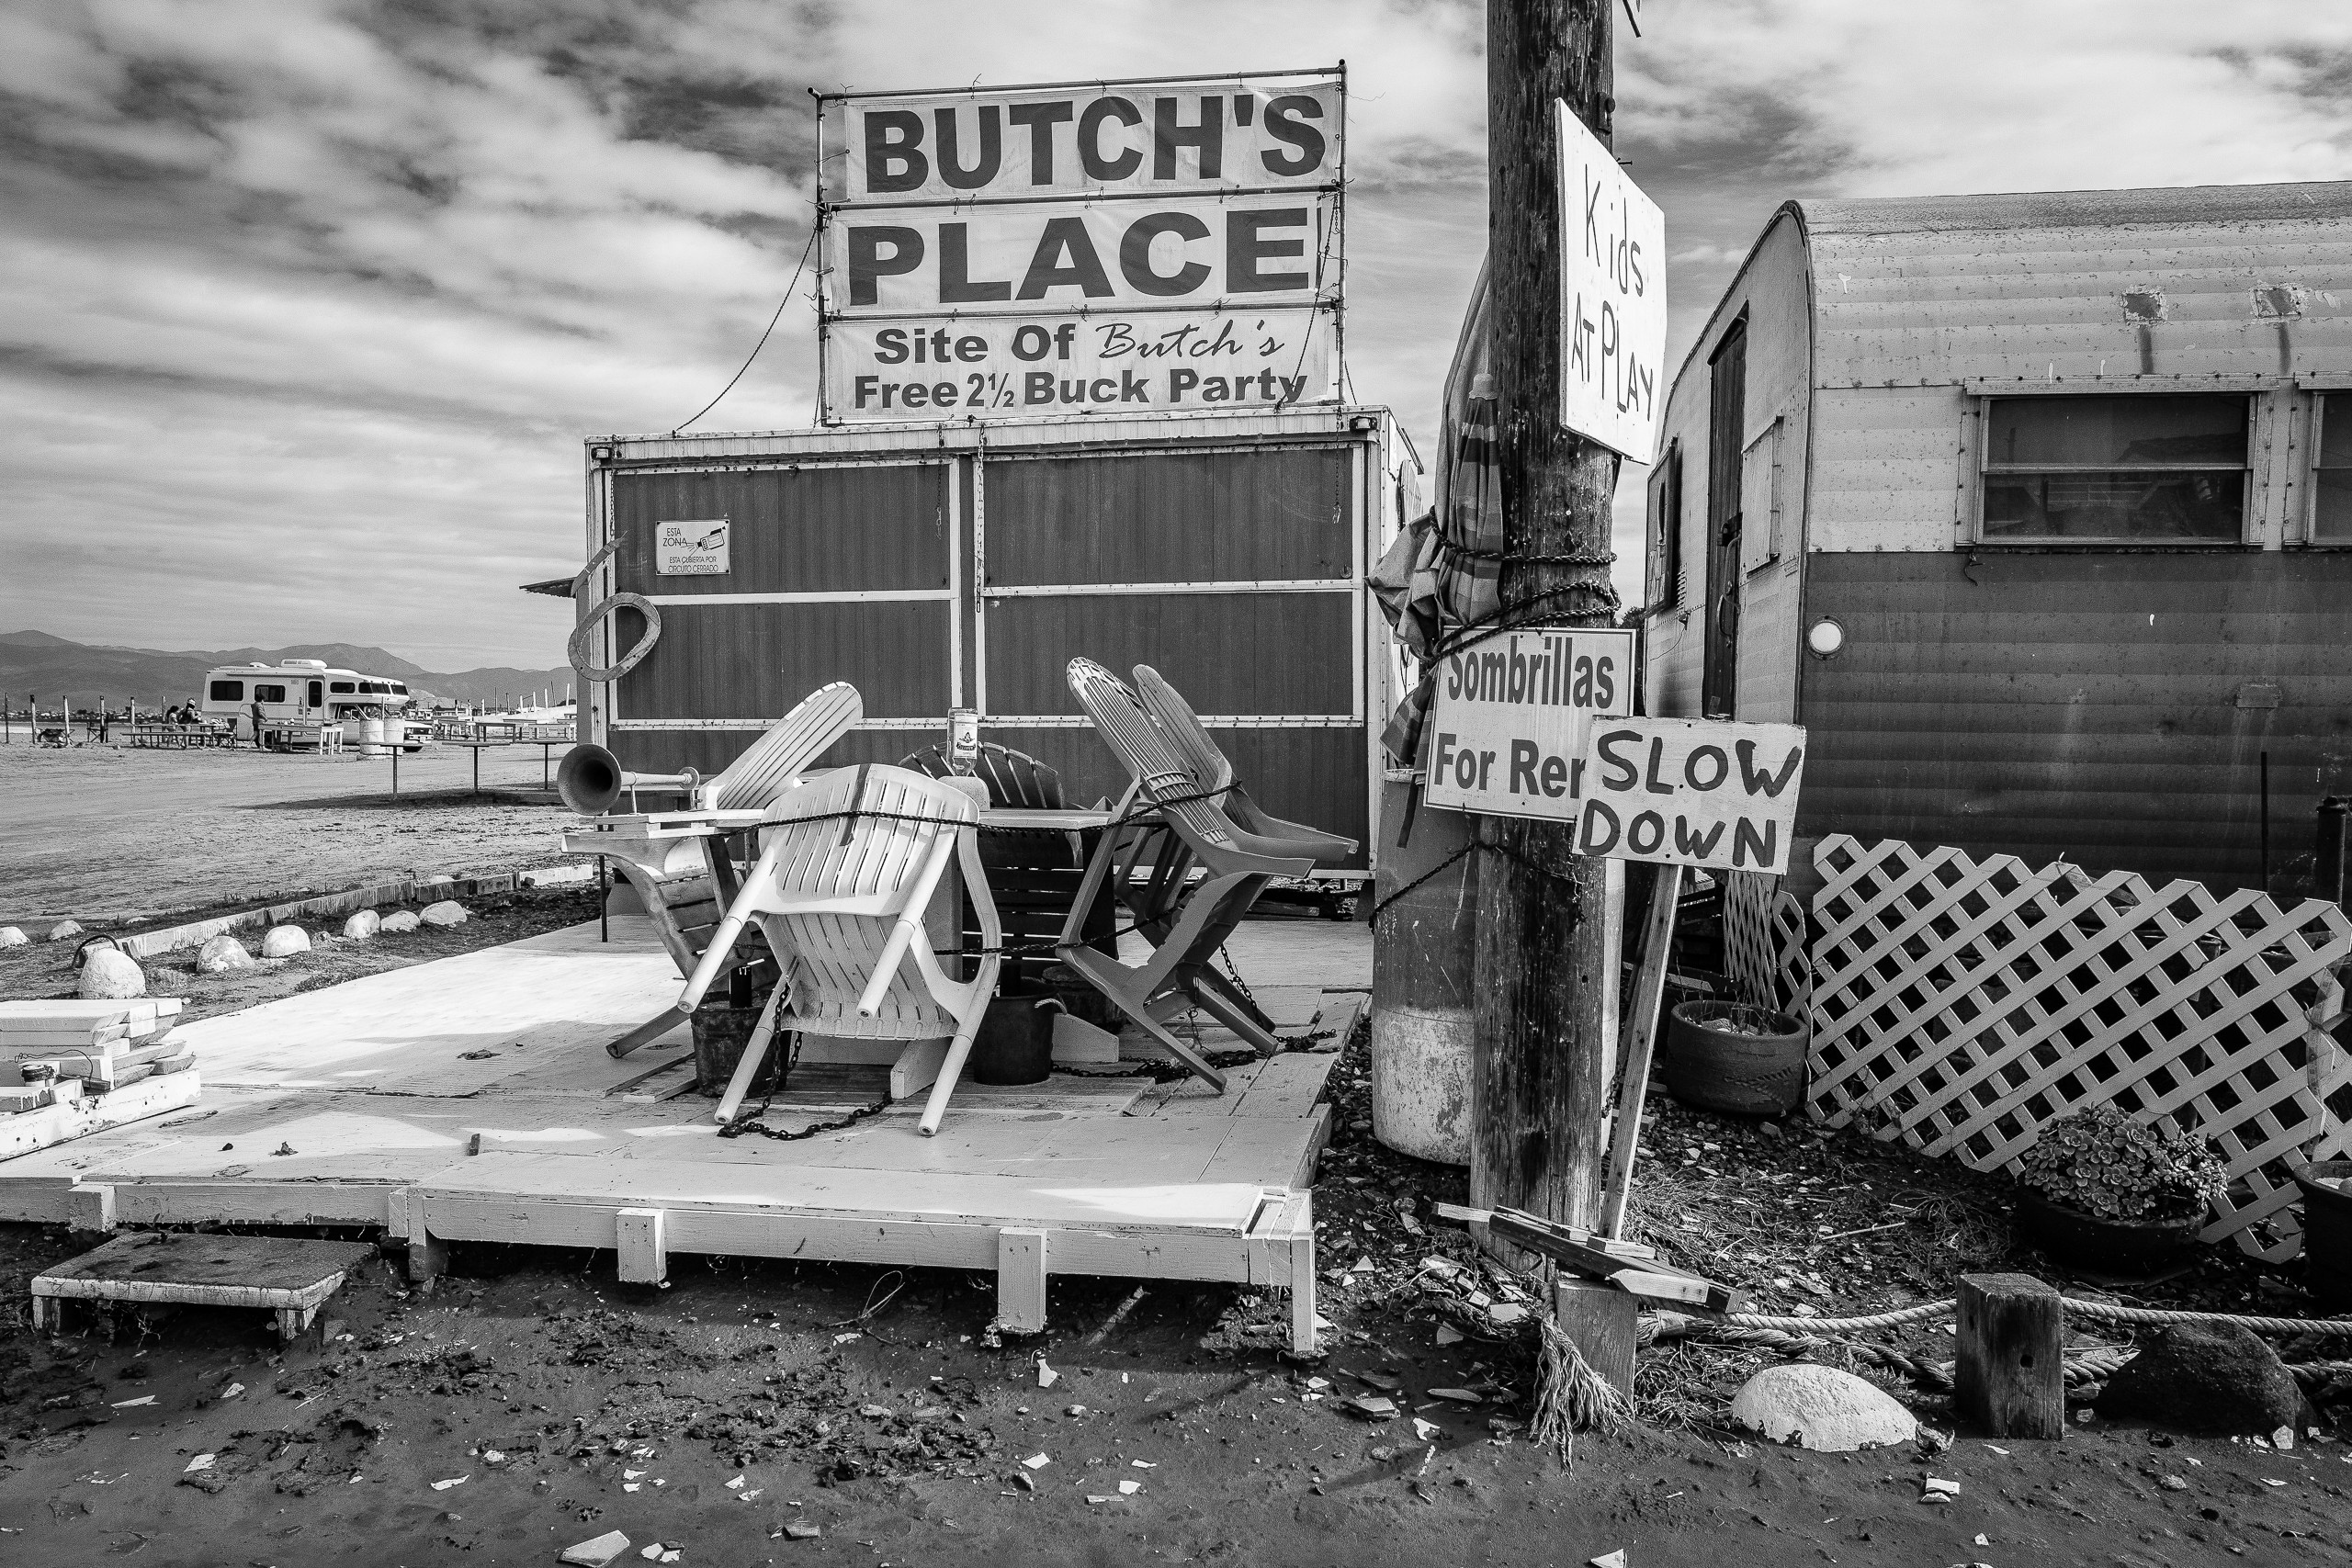 Butch's Place